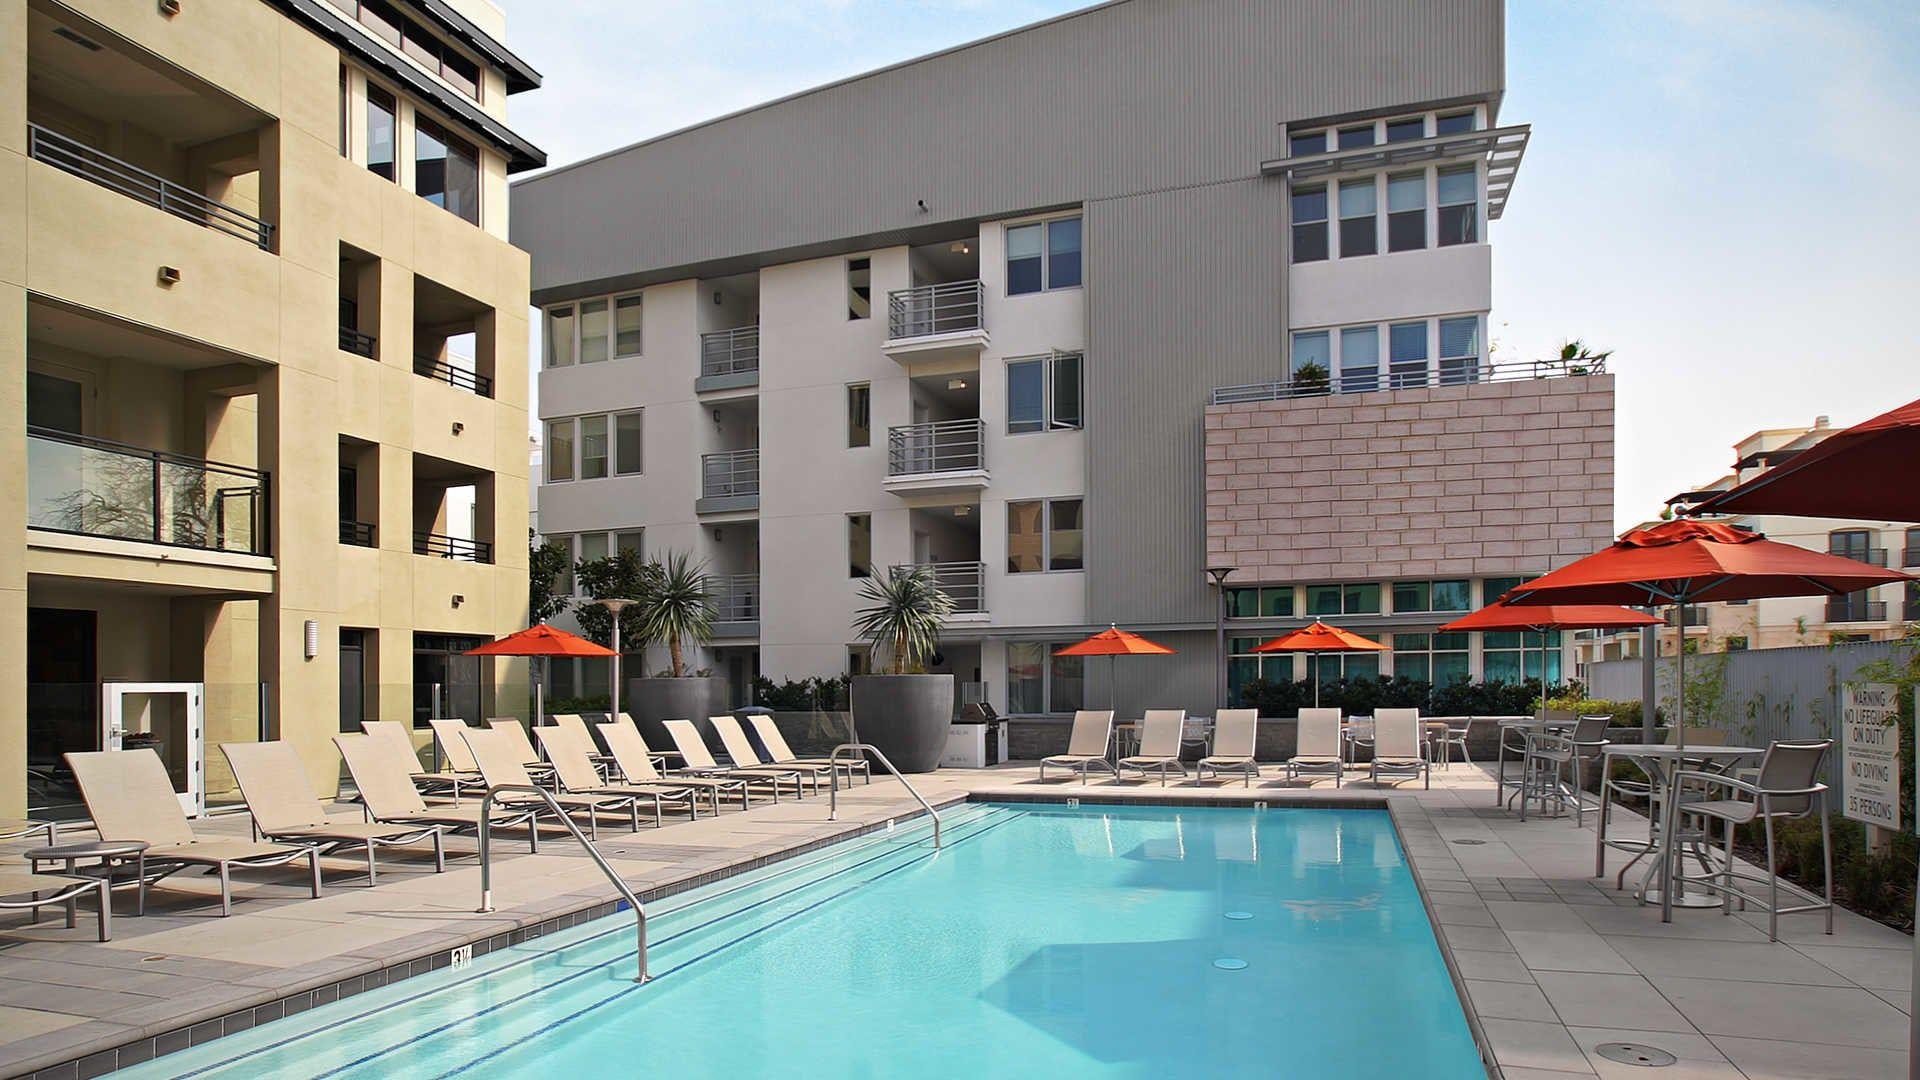 Https Www Google Com Search Q California Apartment Open Air Fire Stairs Client Firefox B 1 Sou California Apartment Apartments For Rent Apartment Home Living